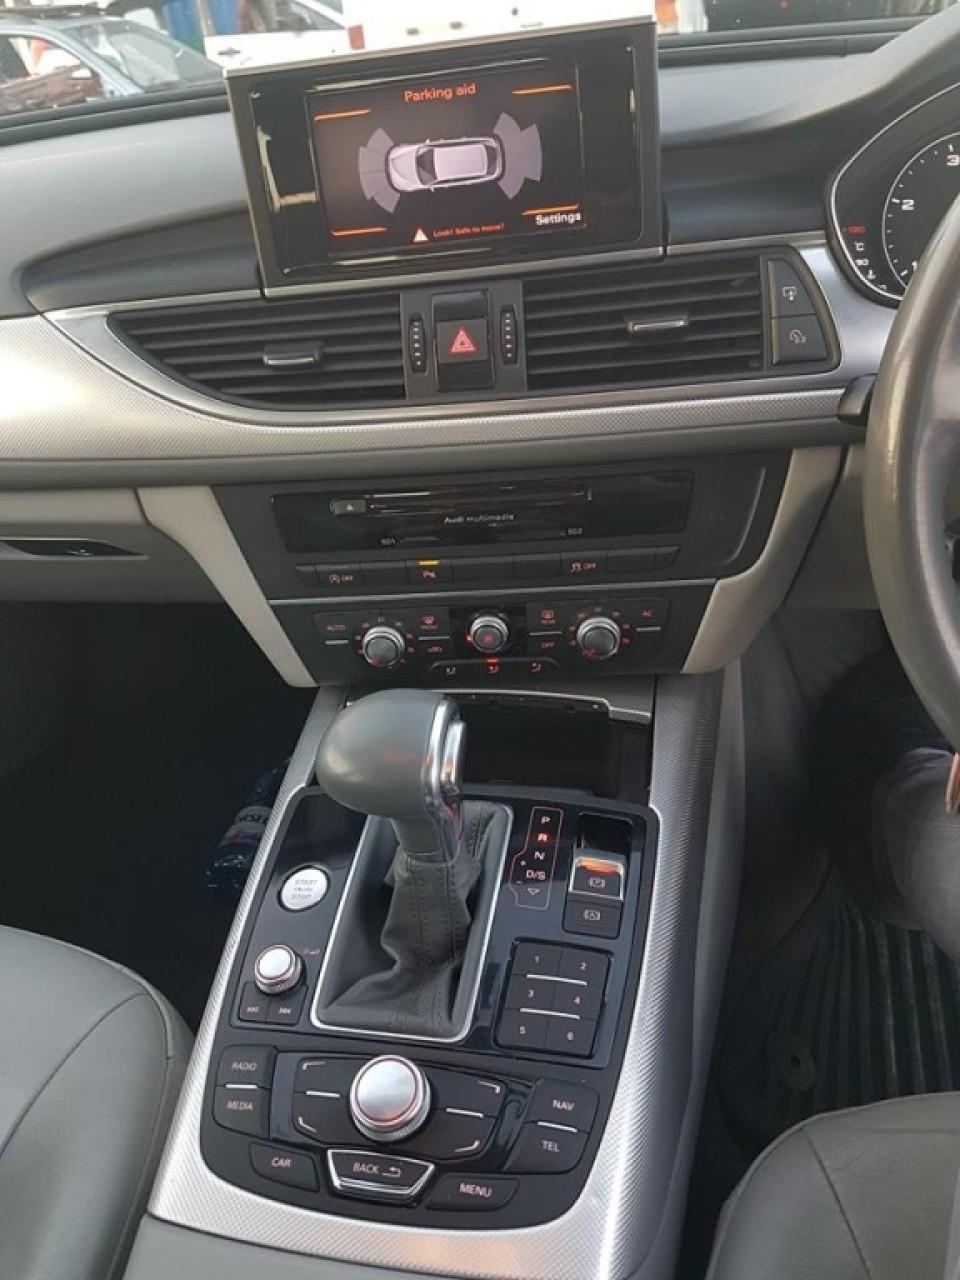 Aripa dreapta spate Audi A6 4G C7 2012 variant 2.0 tdi